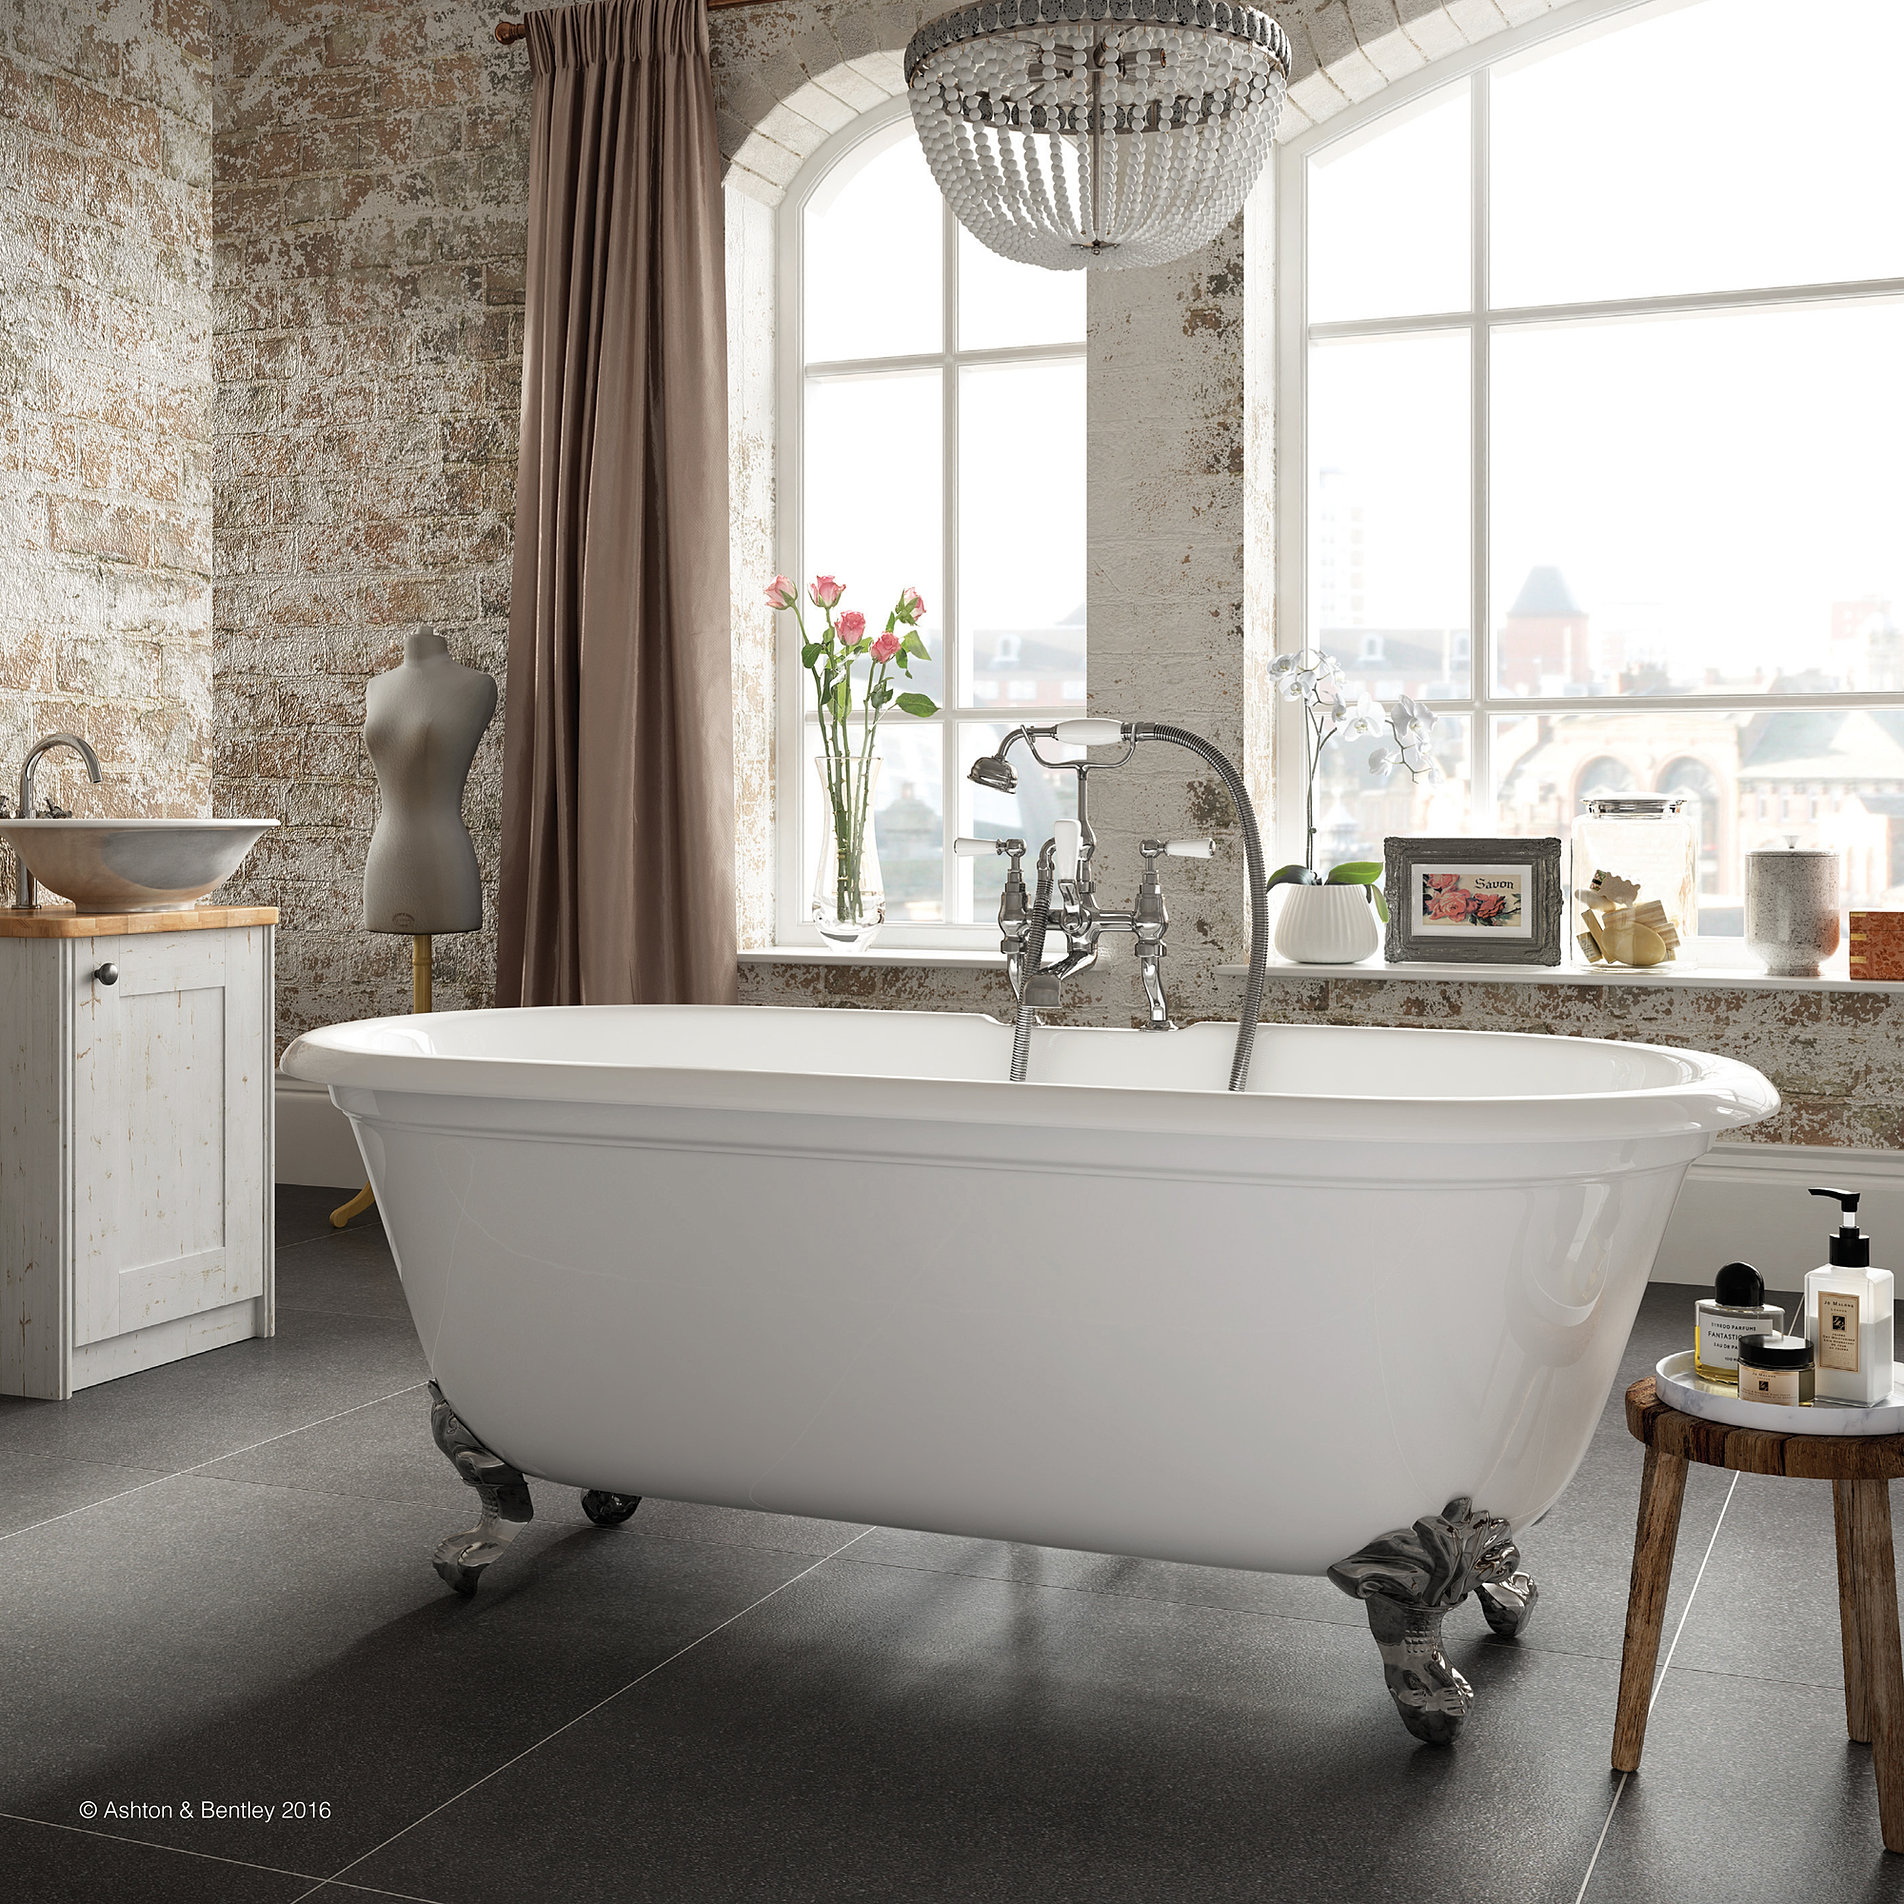 luxury bathrooms. Luxury Bathrooms Sutton Coldfield  Bathroom Design Bathart